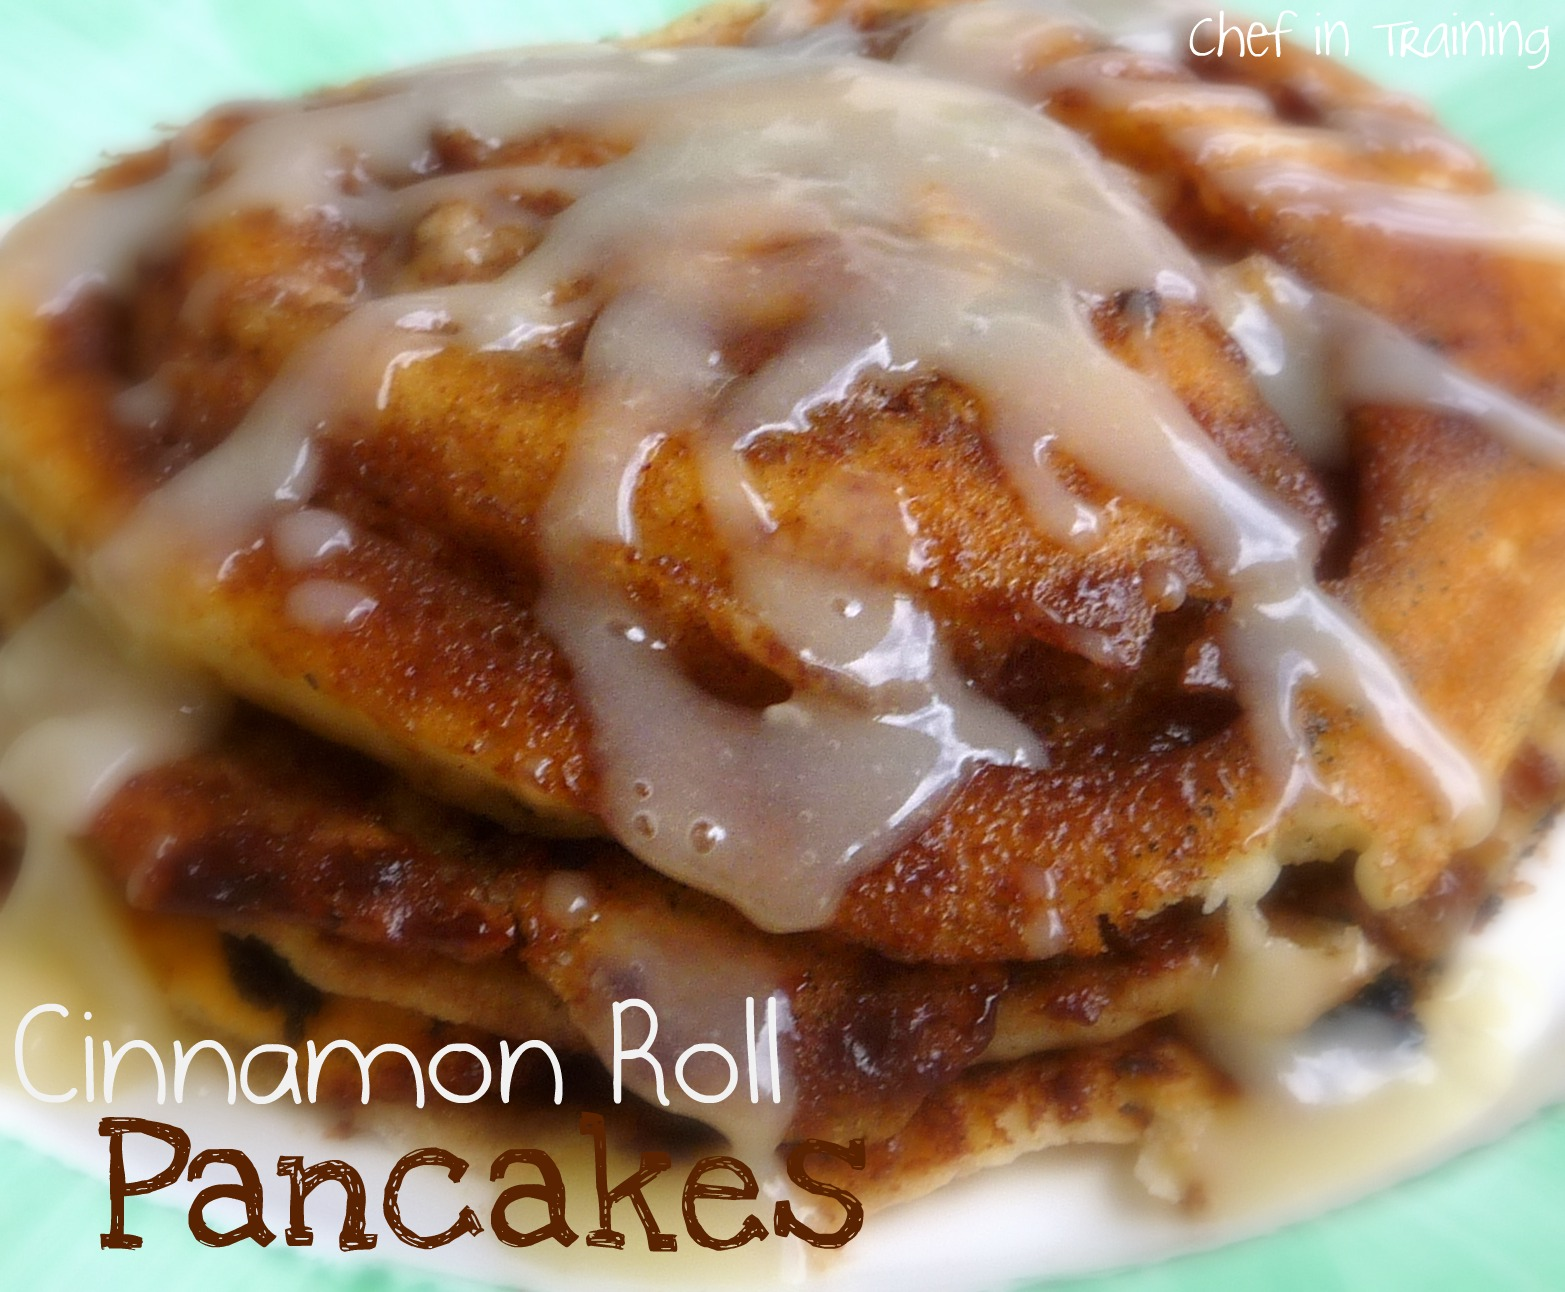 Cinnamon Roll Pancakes - Chef in Training